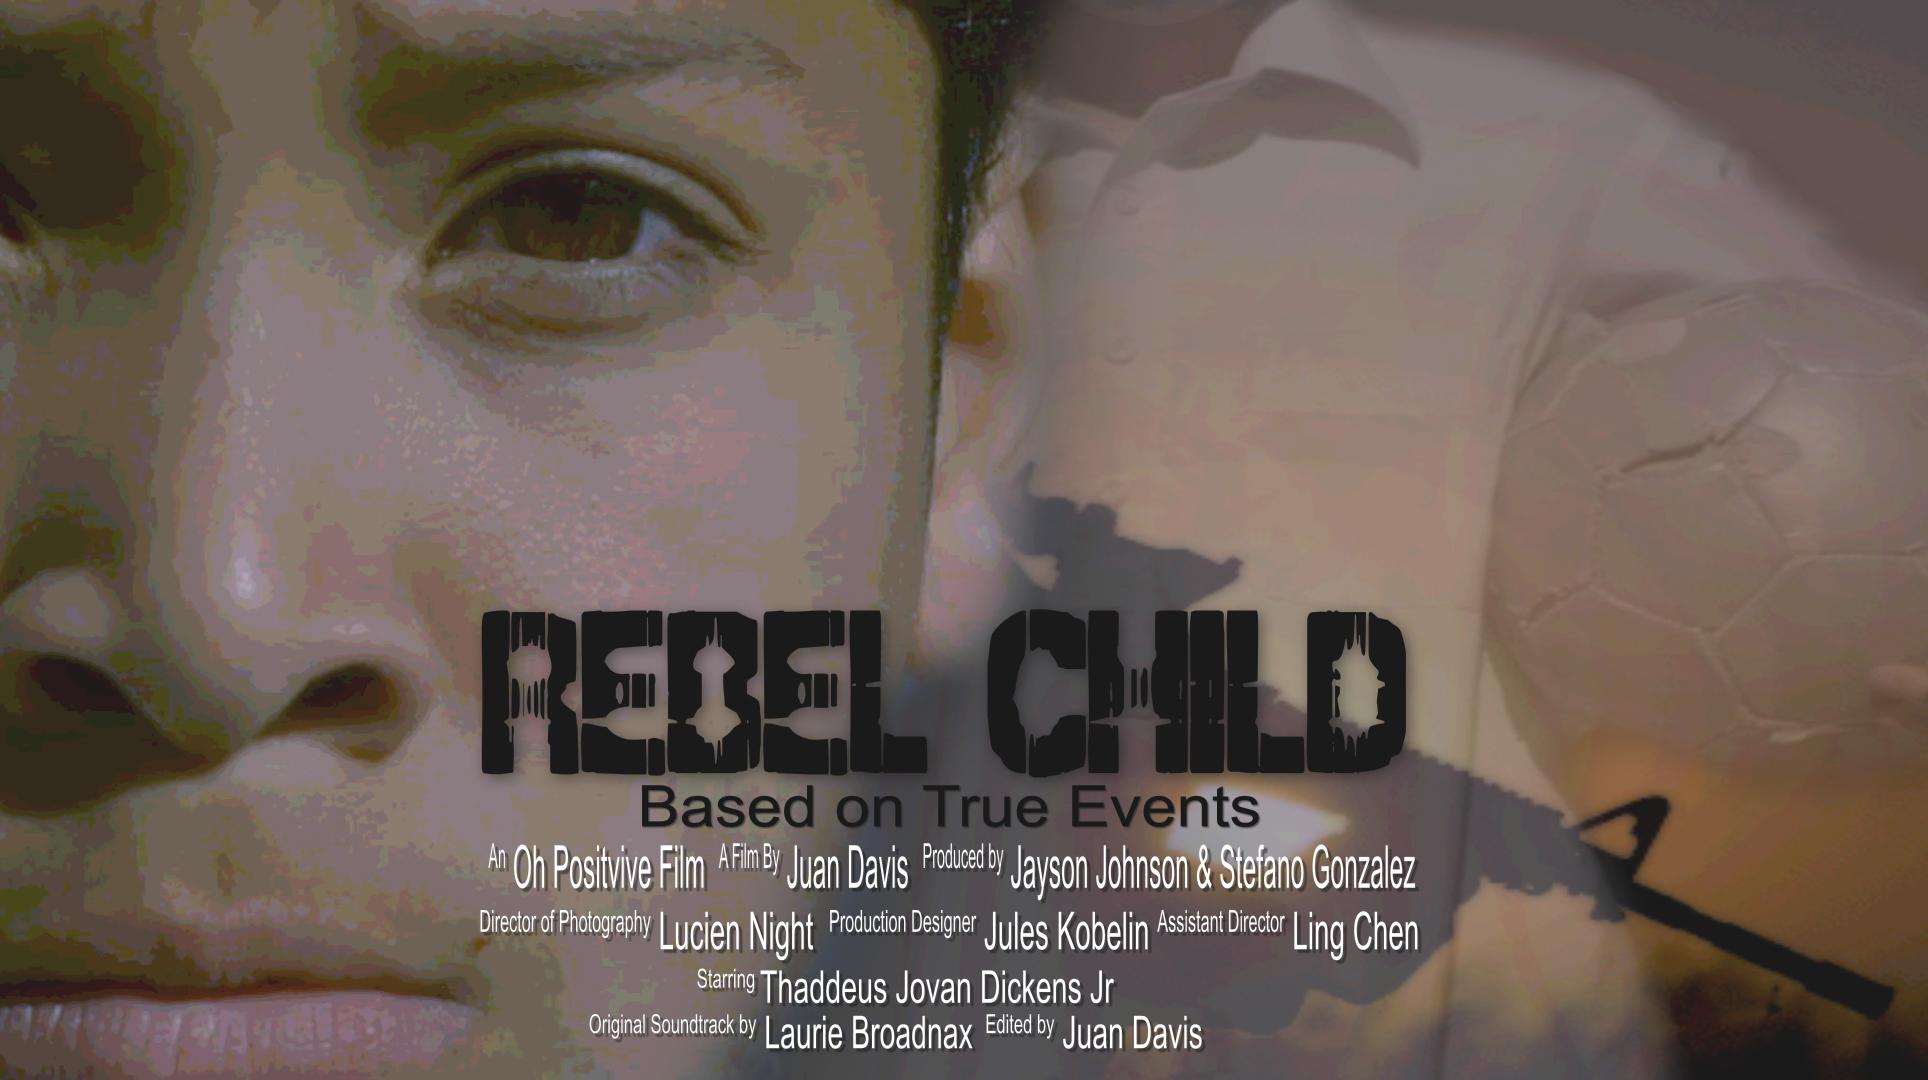 Rebel Child Poster